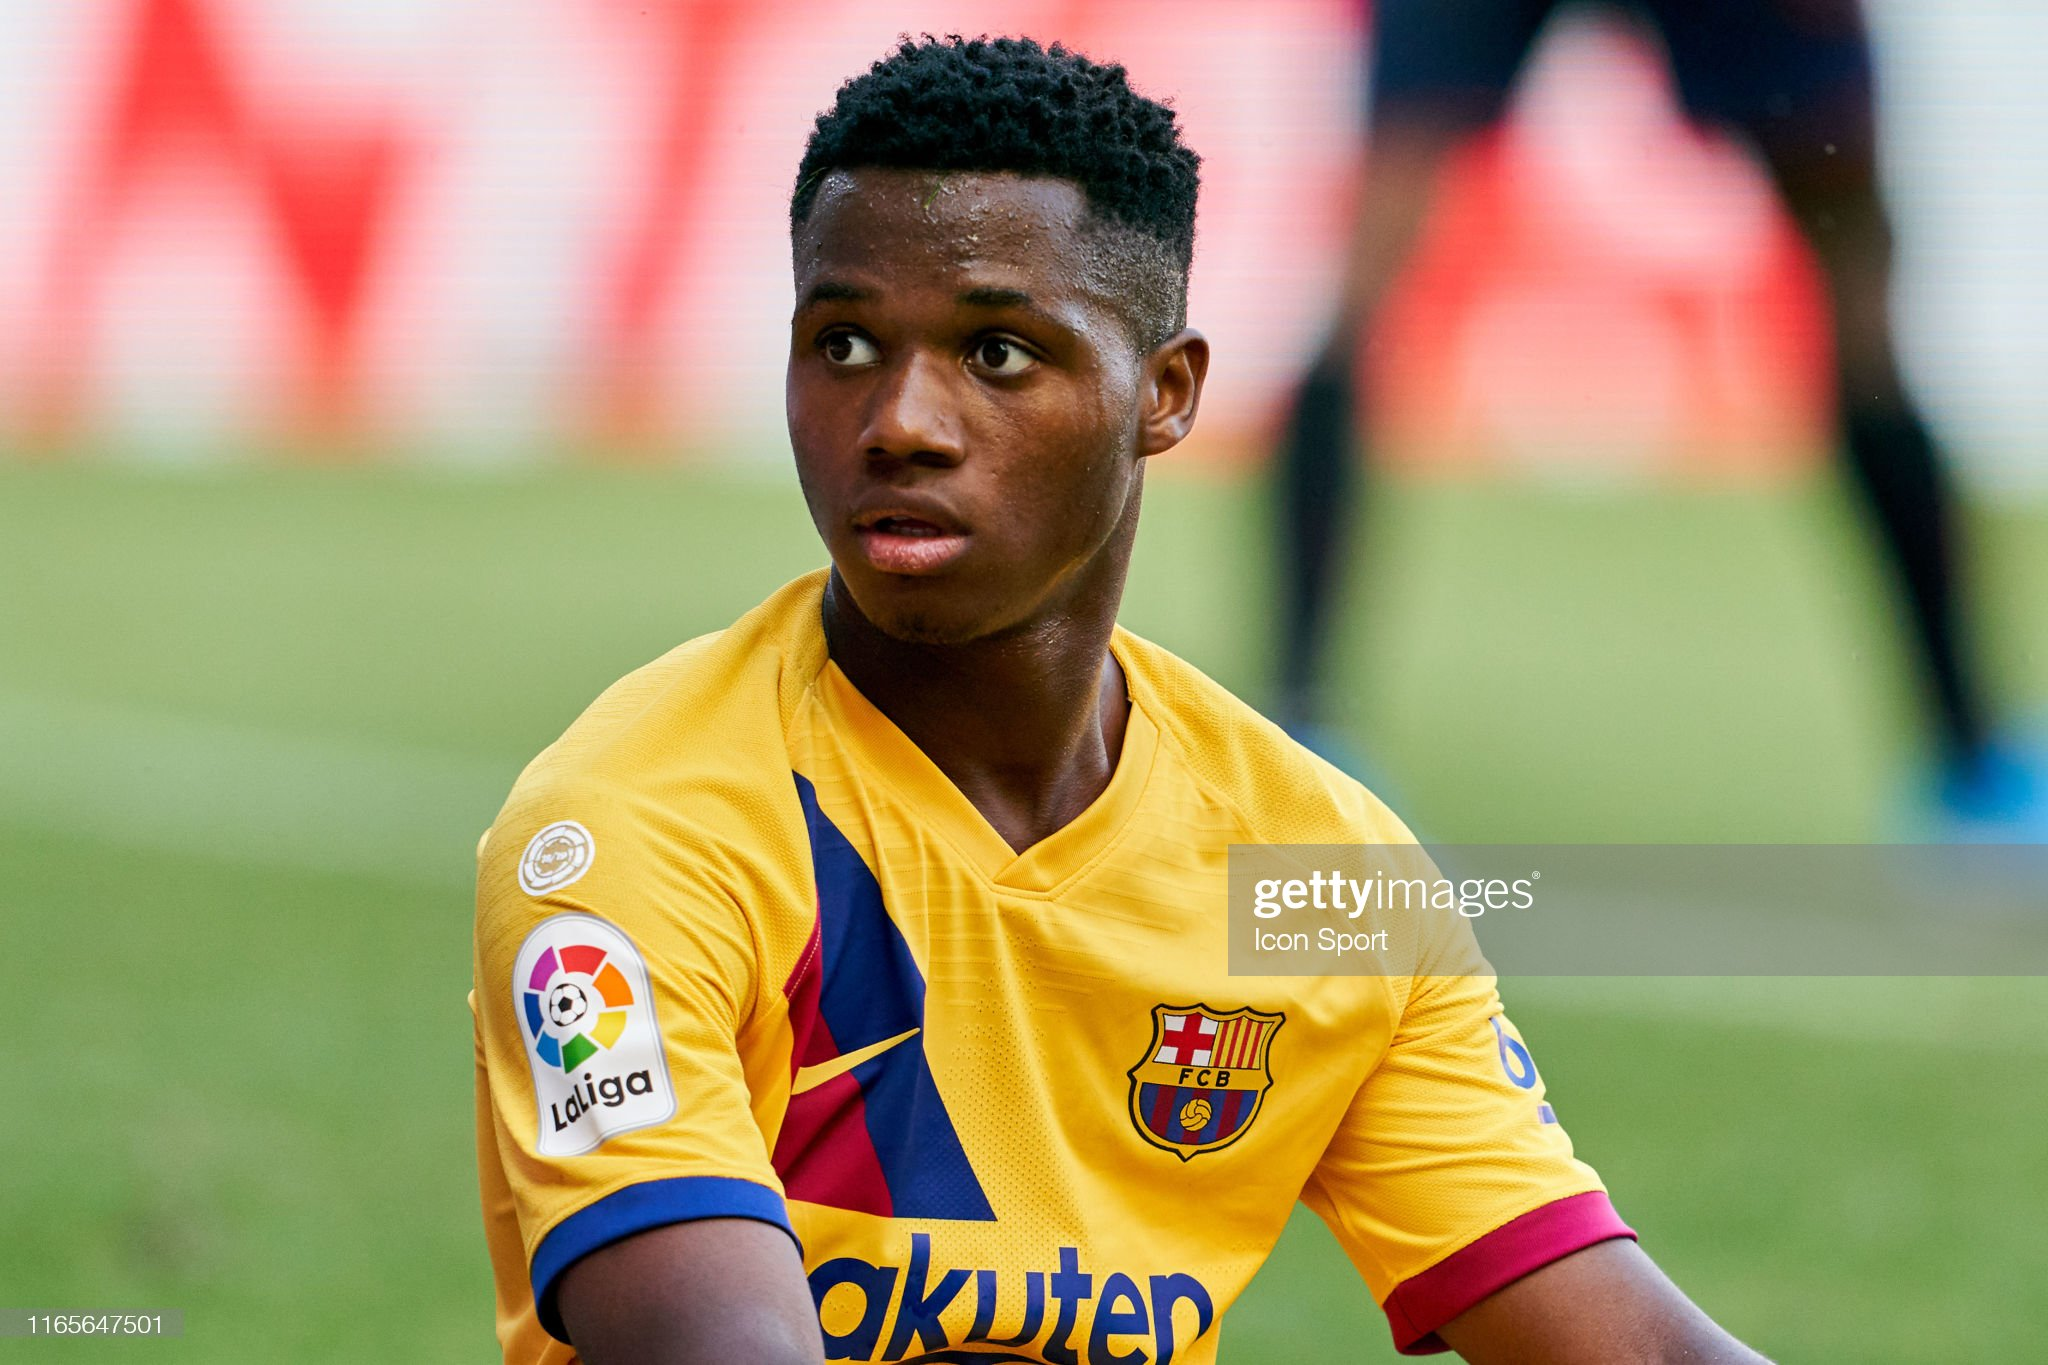 صور مباراة : أوساسونا - برشلونة 2-2 ( 31-08-2019 )  Ansu-fati-of-fc-barcelona-during-the-liga-match-between-osasuna-and-picture-id1165647501?s=2048x2048